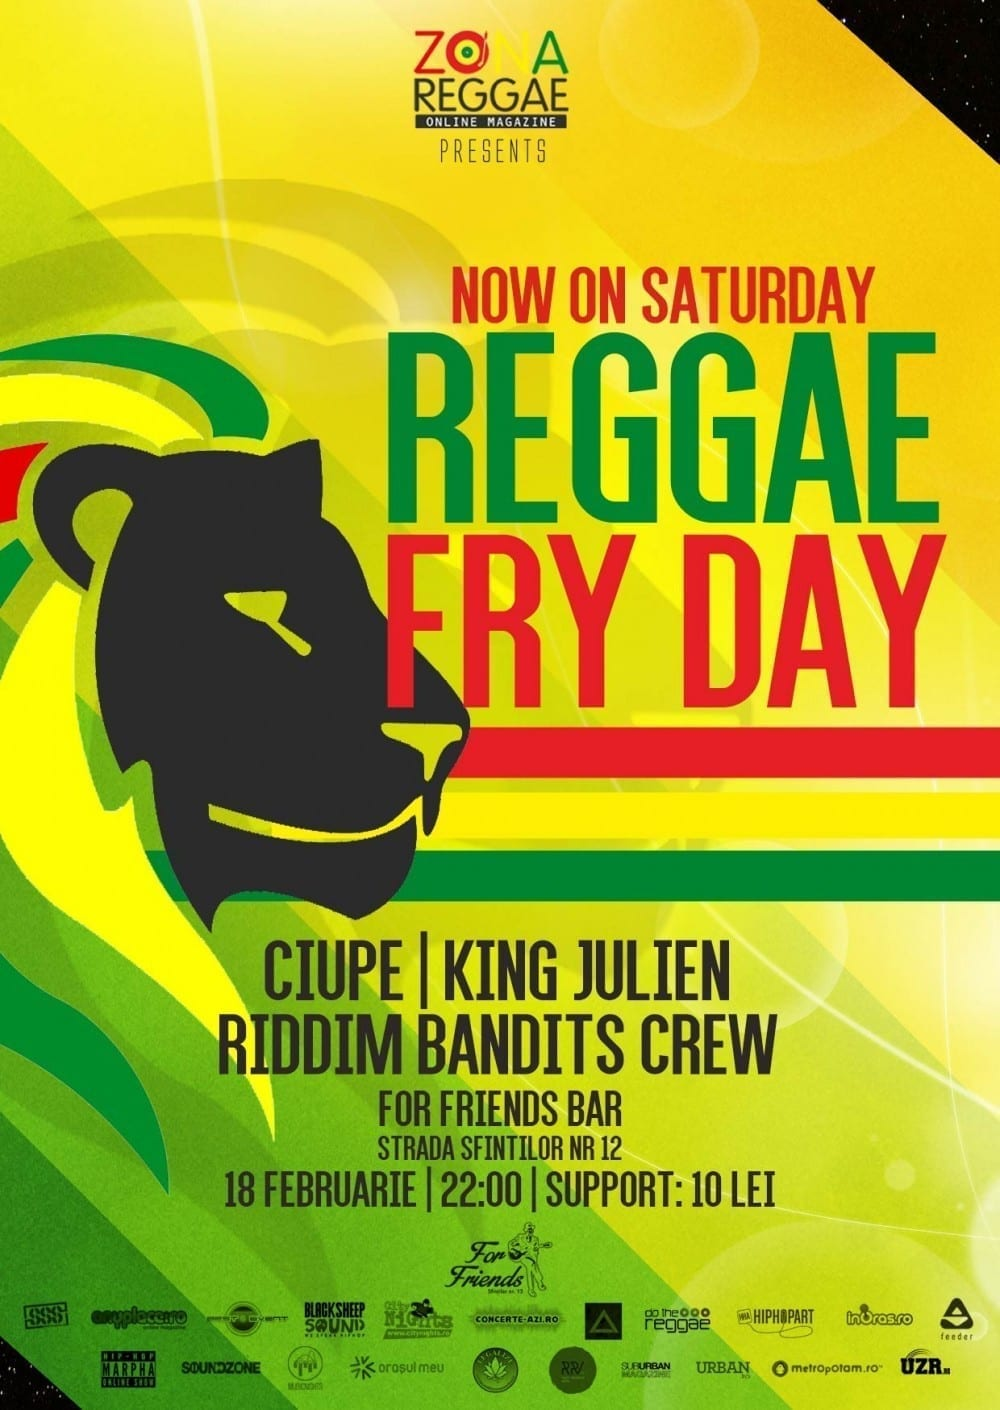 Reggae-Fry-day-18-februarie---site